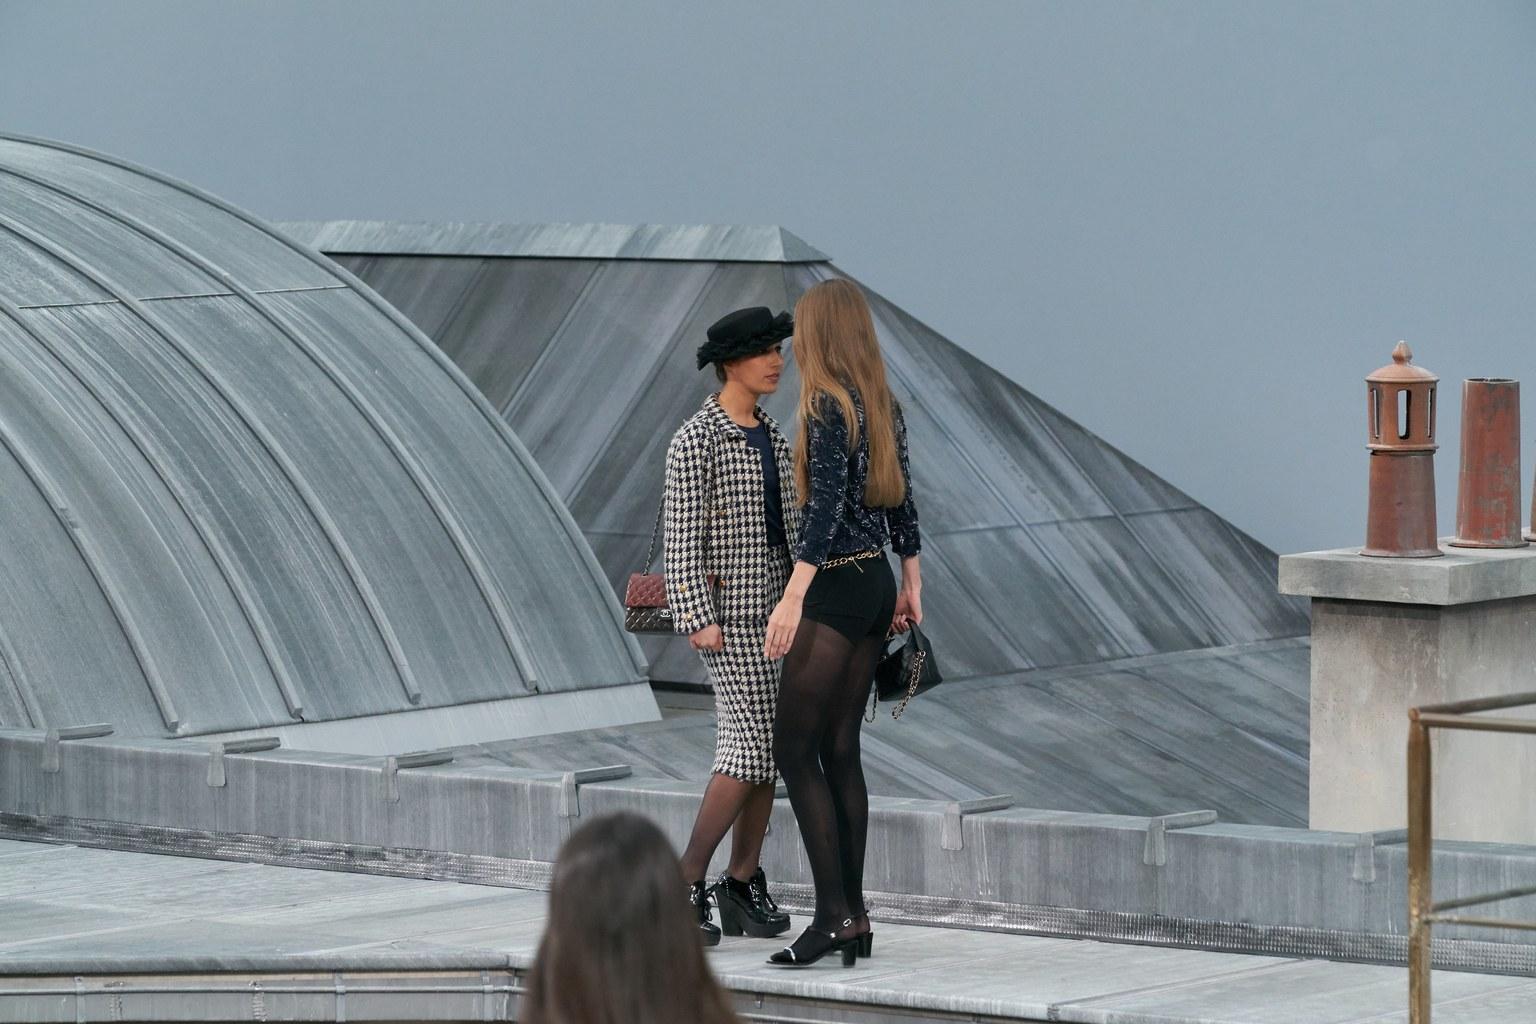 chanel 3 - La magia della Paris Fashion Week - prima parte